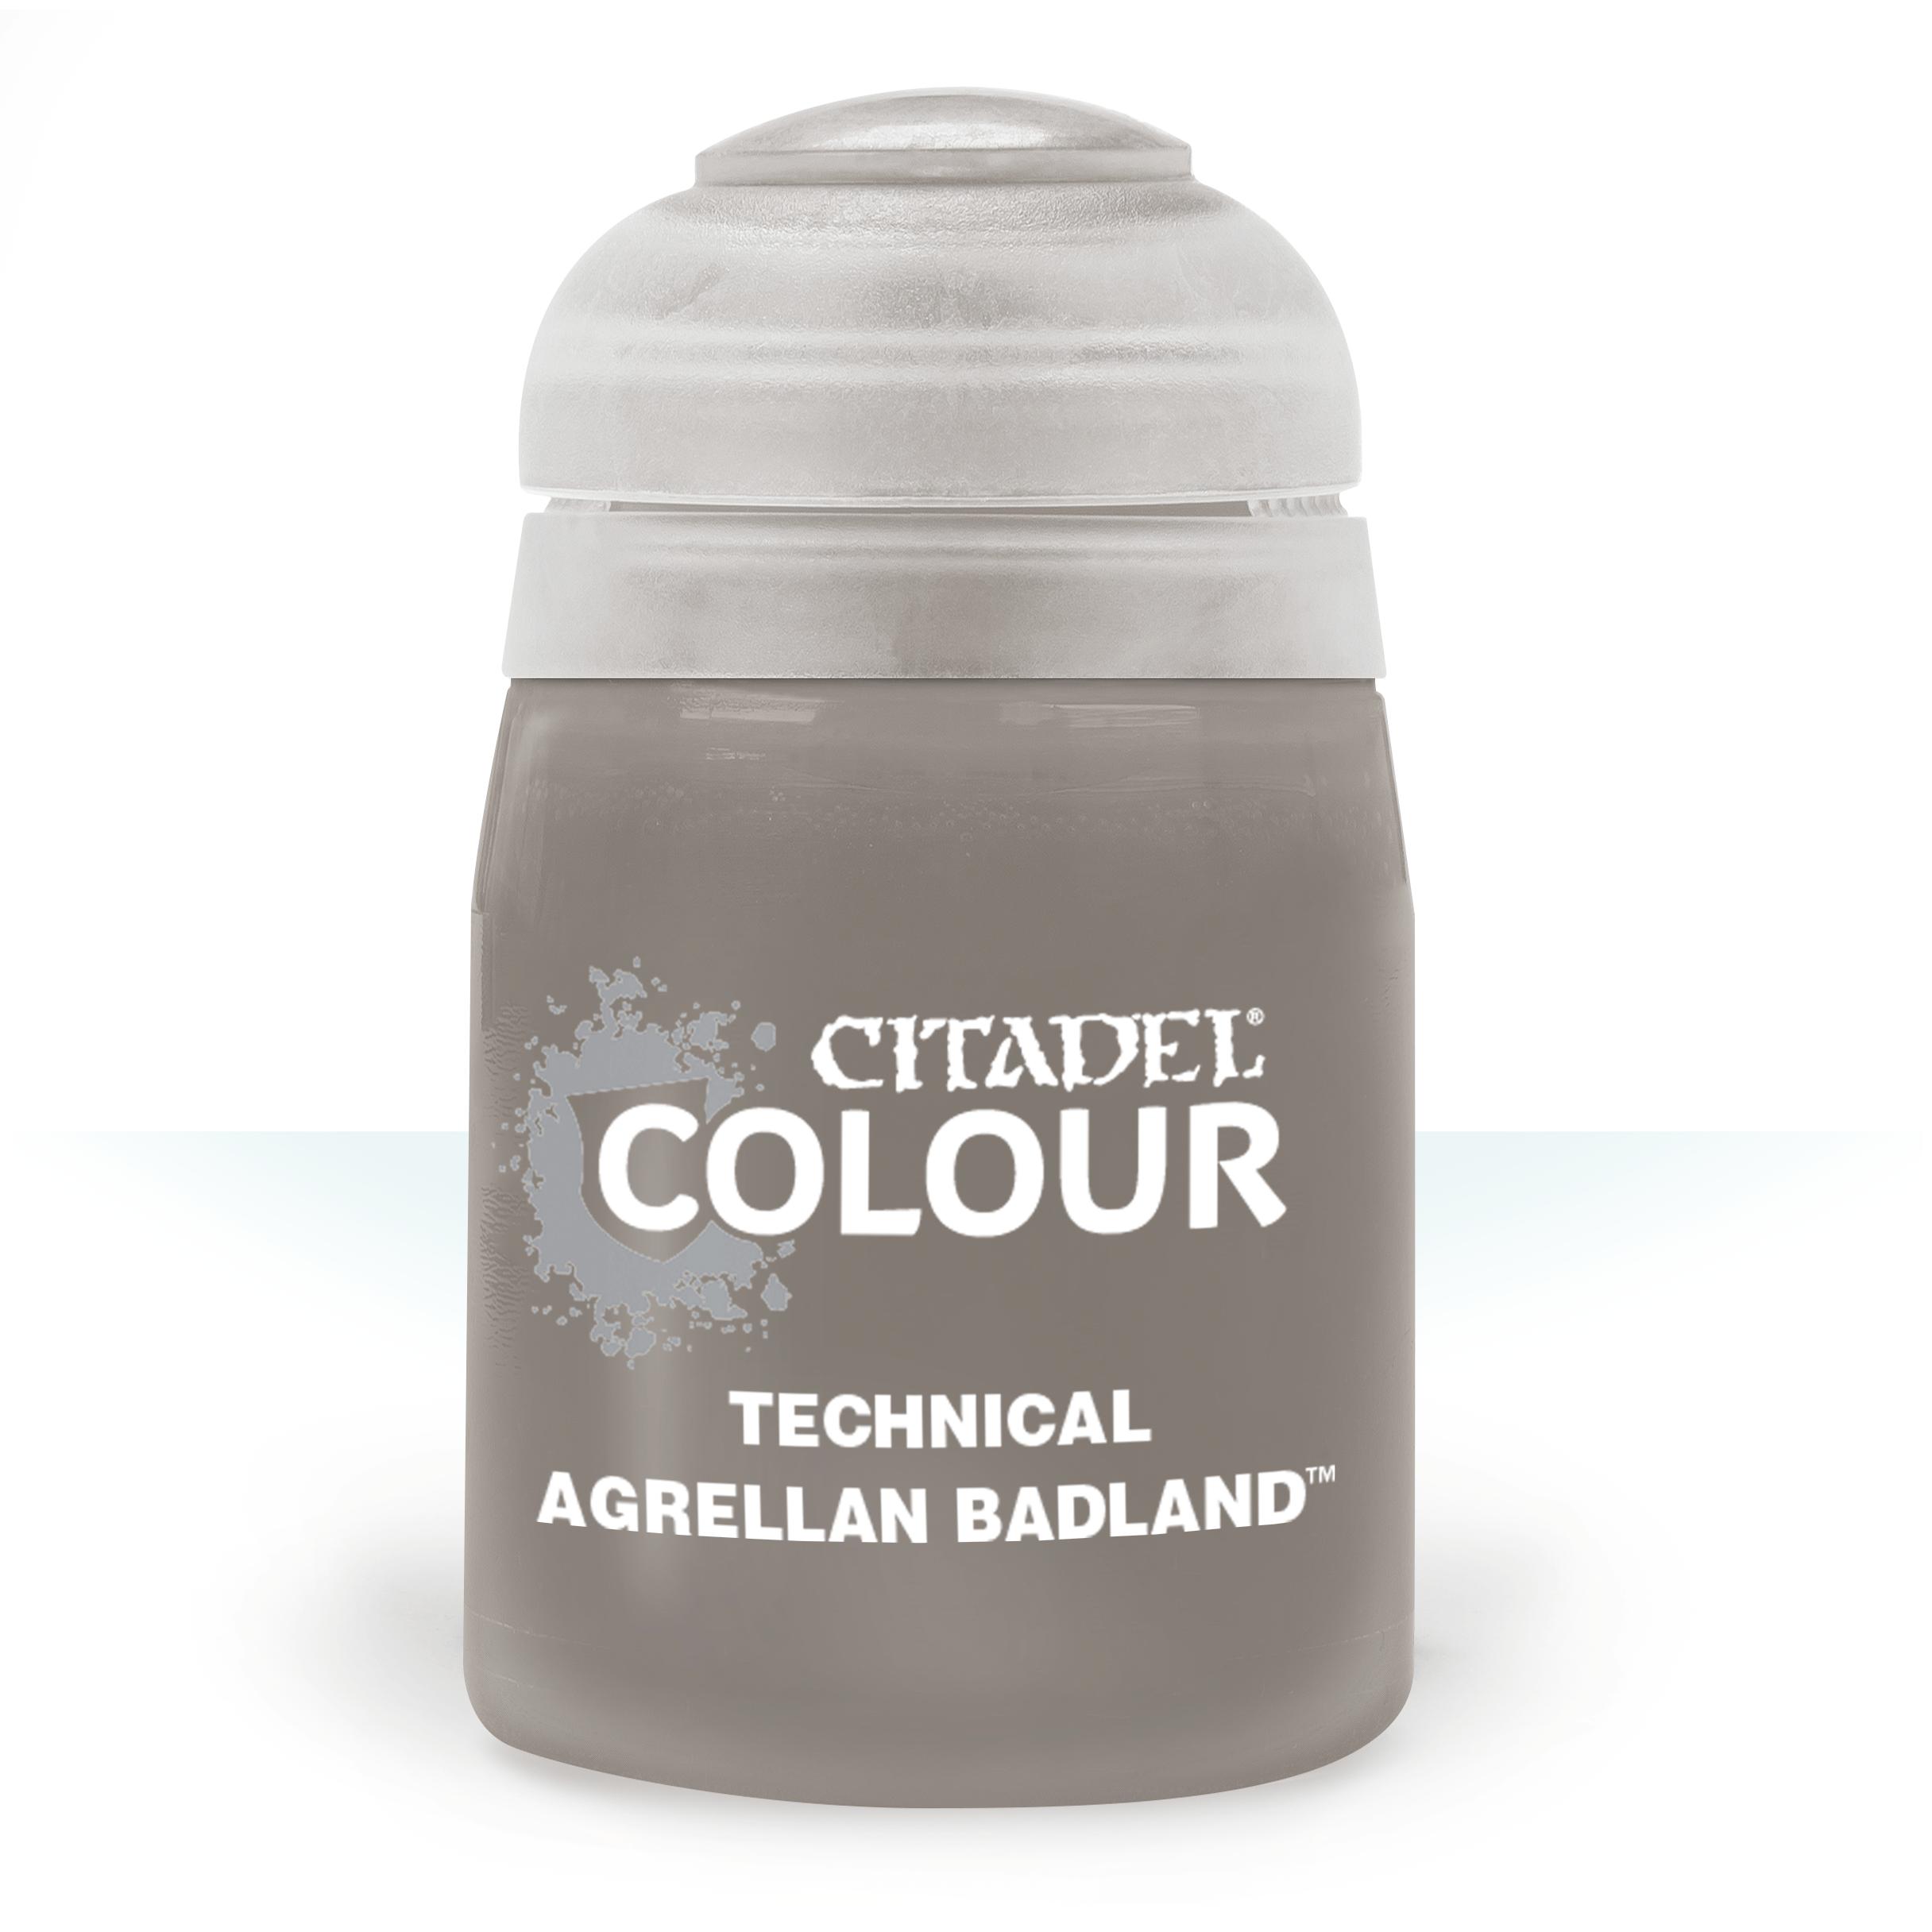 Agrellan Badland, Citadel Technical 24ml